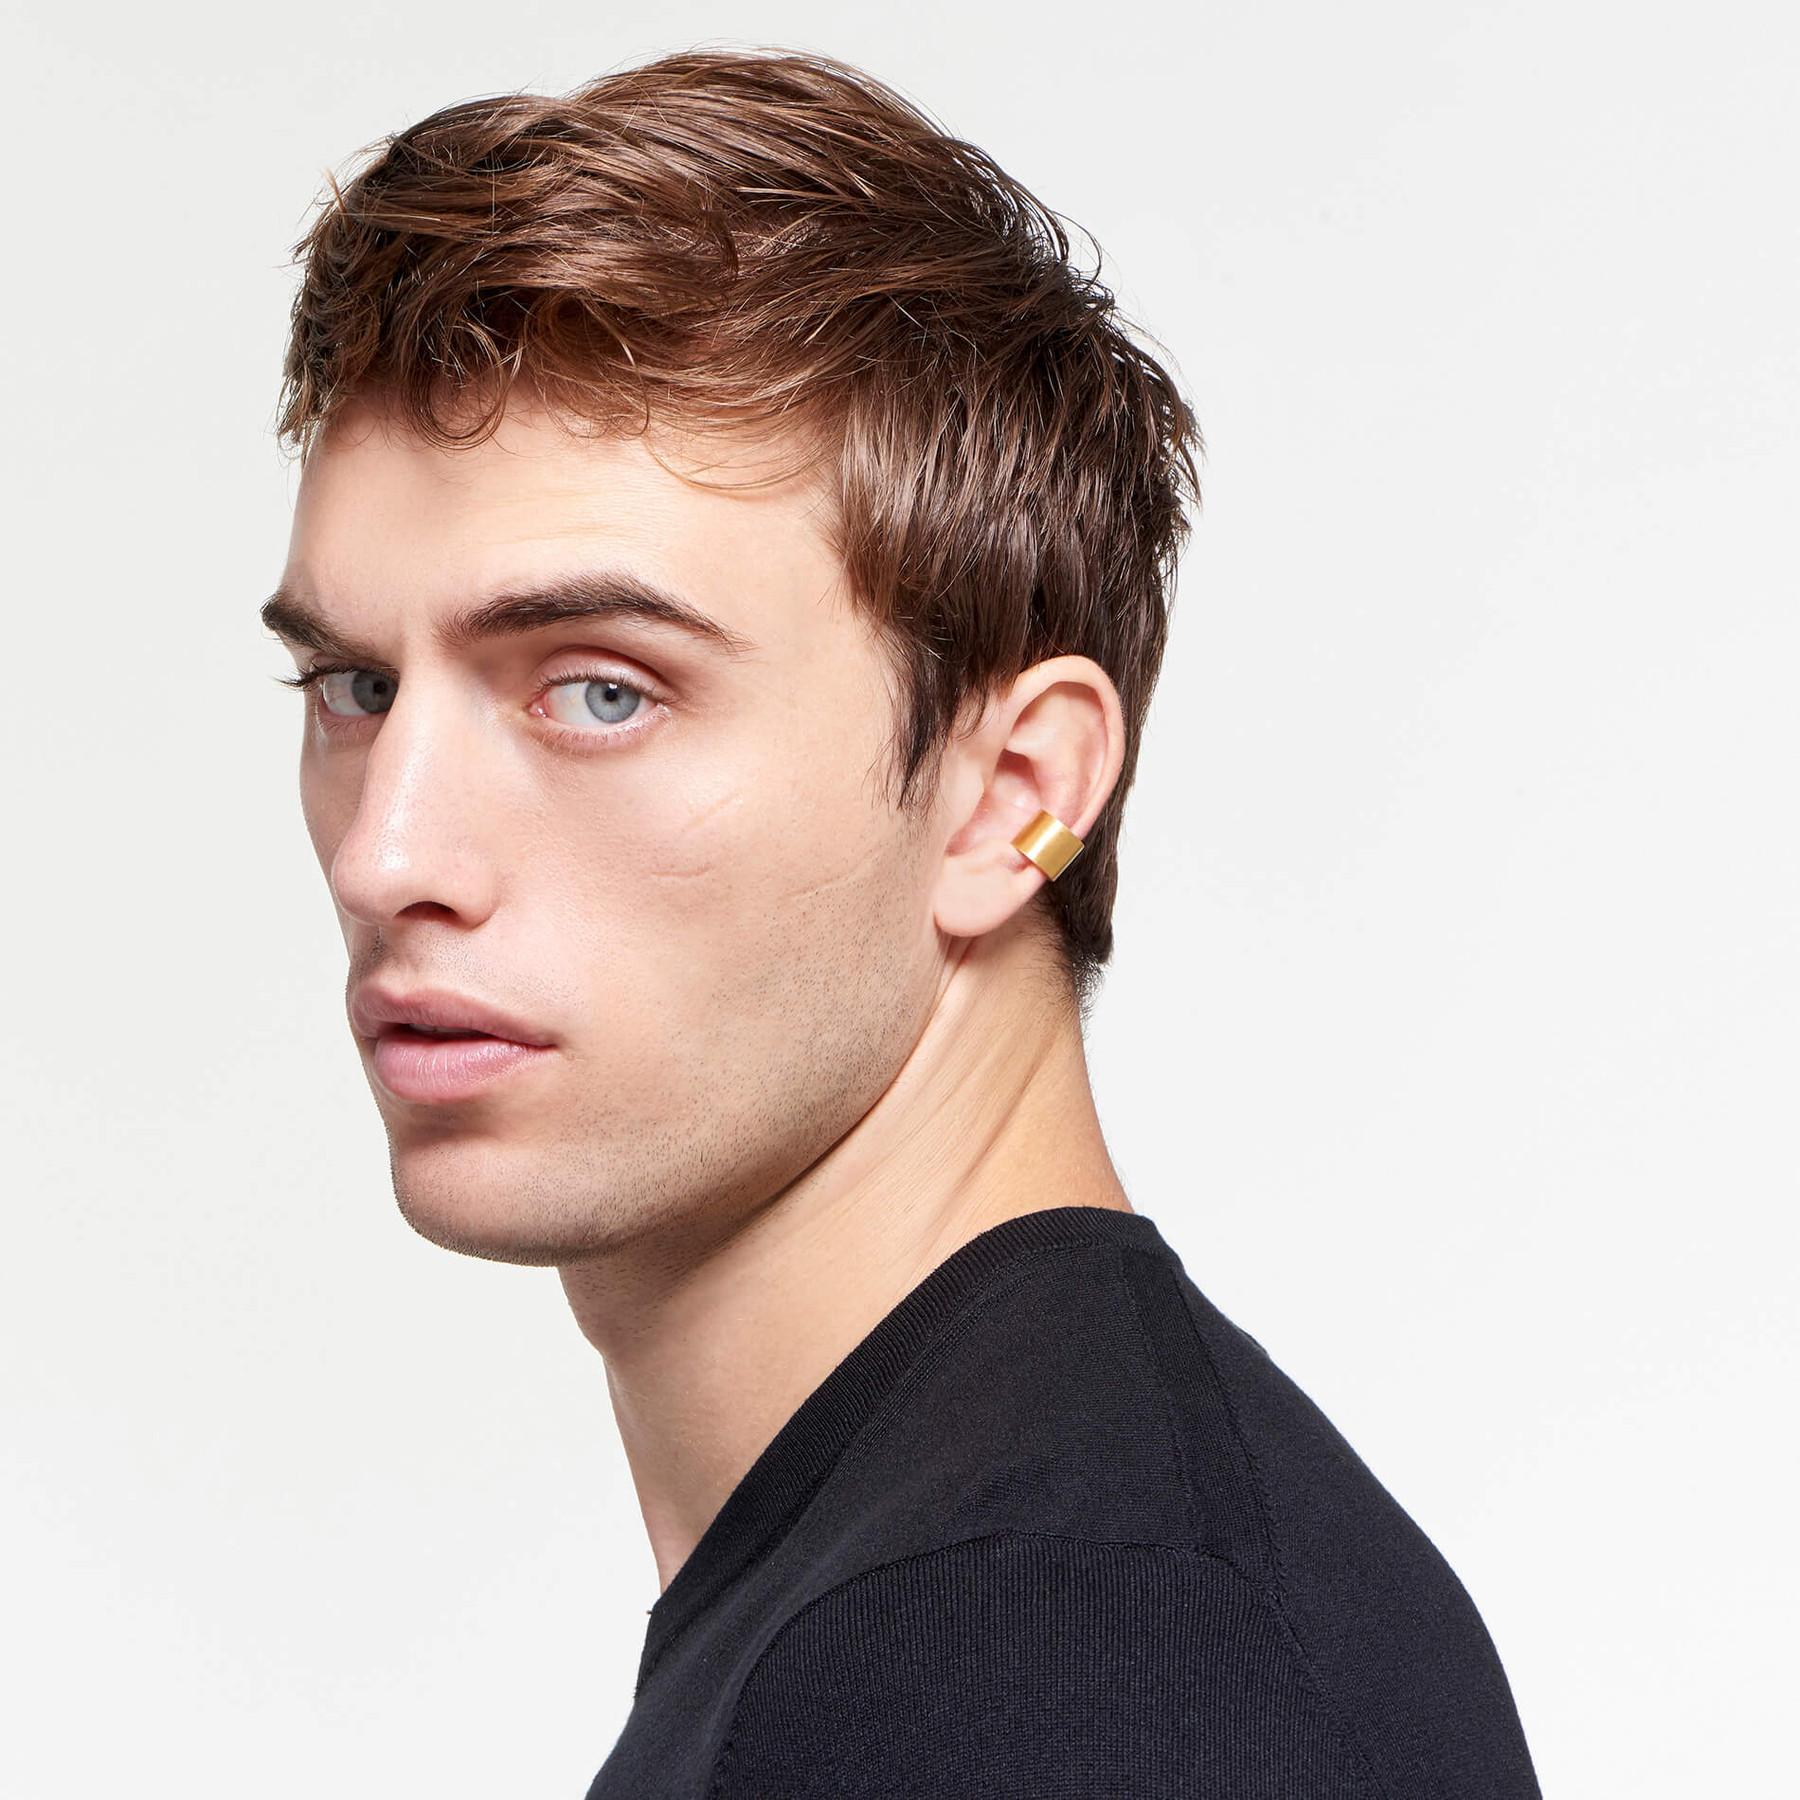 intense male model wearing satin 22 karat gold ear cuff